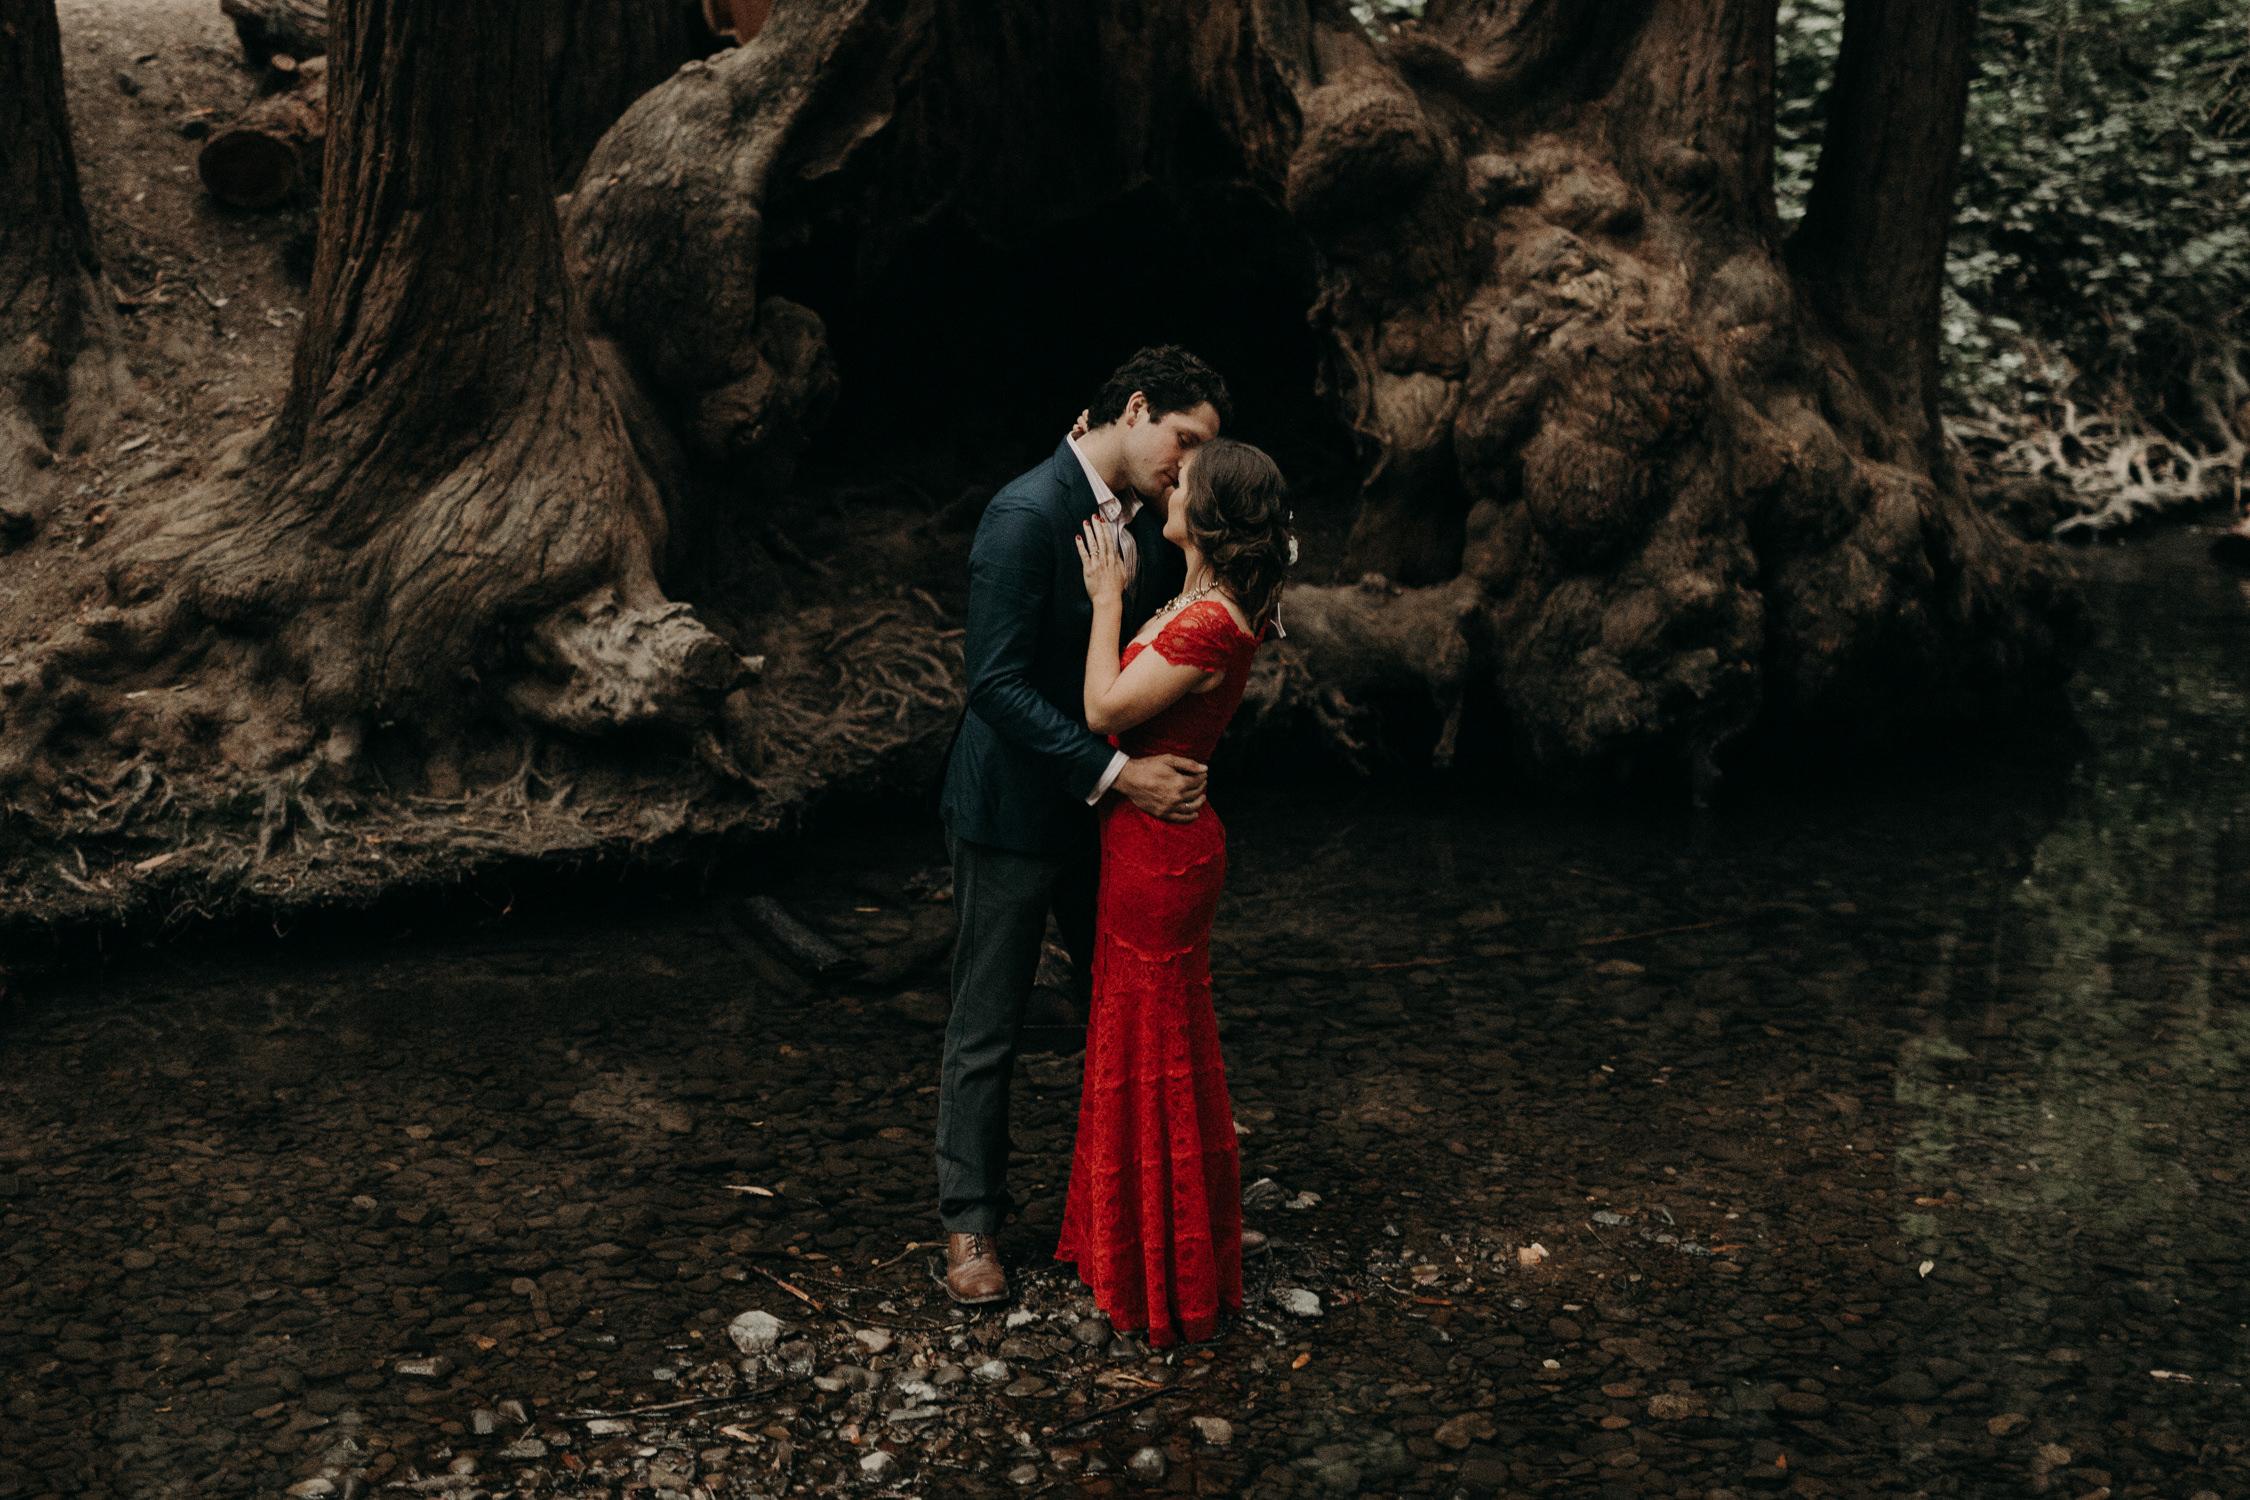 couple-intimate-engagement-session-mt-tam-41.jpg